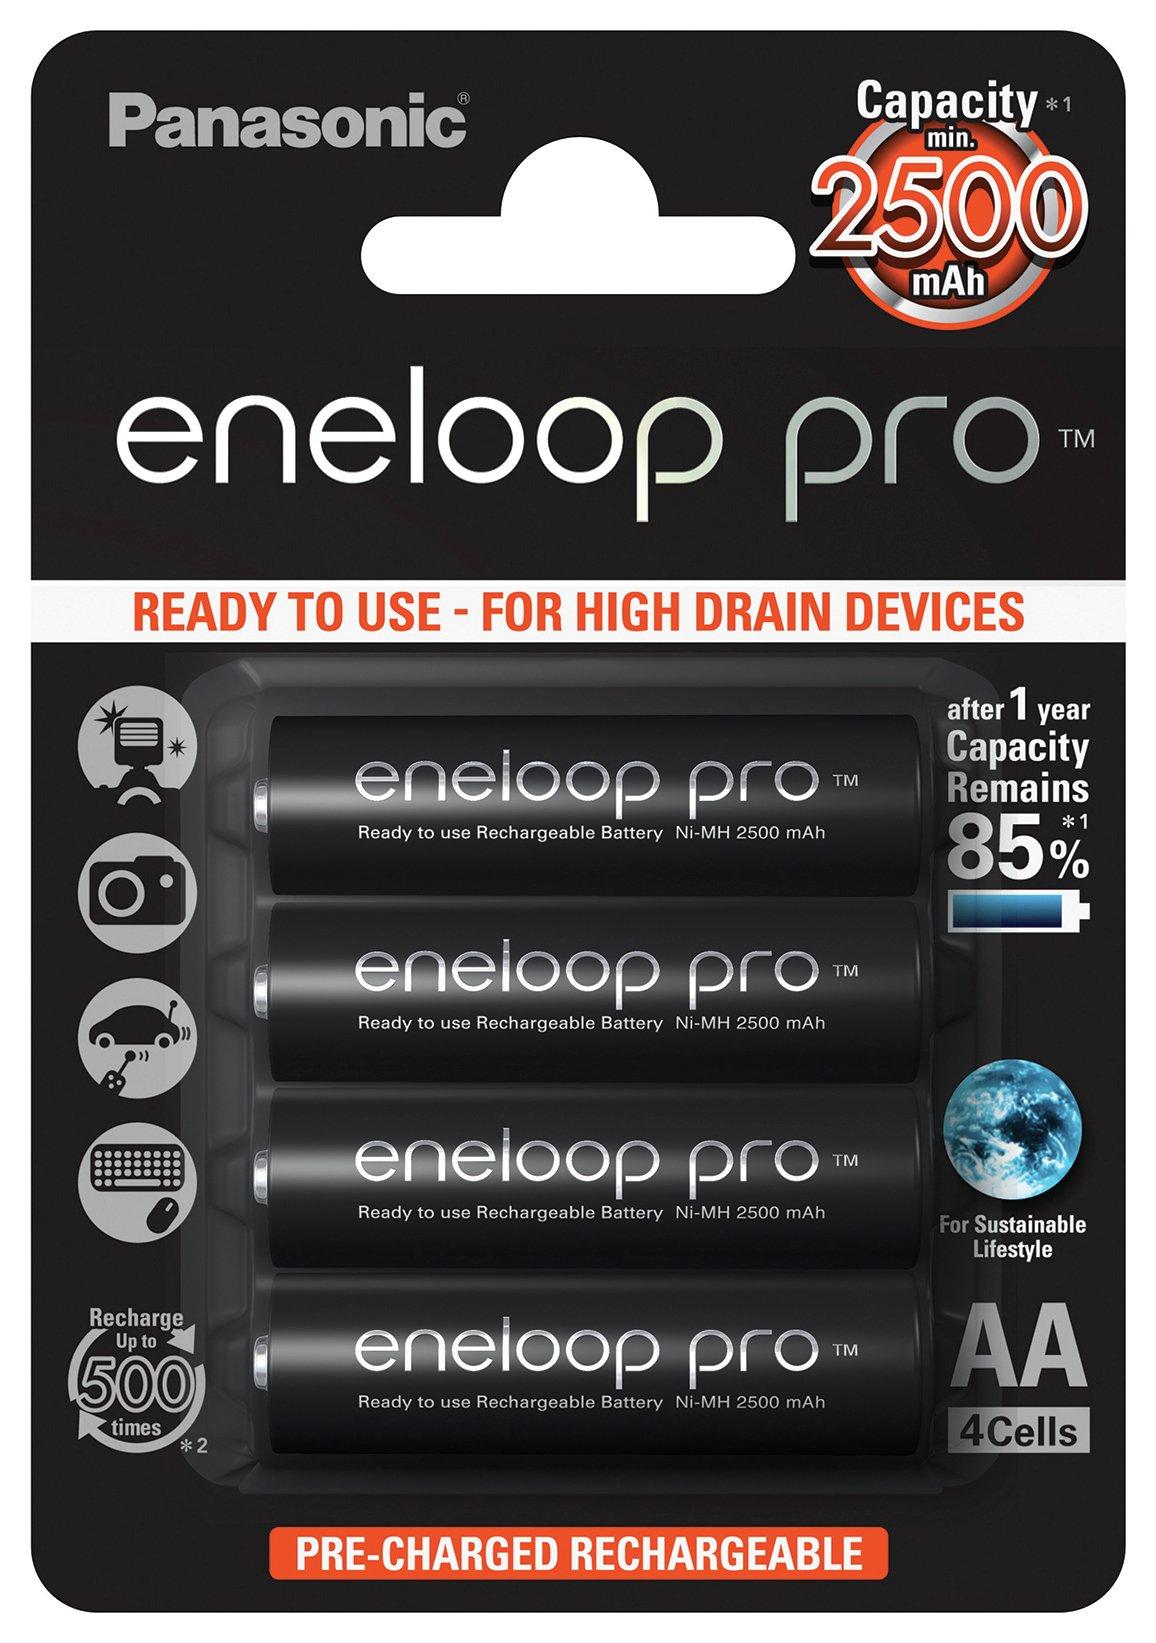 eneloop-pro-2500-mah-rechargeable-aa-batteries-4-pack